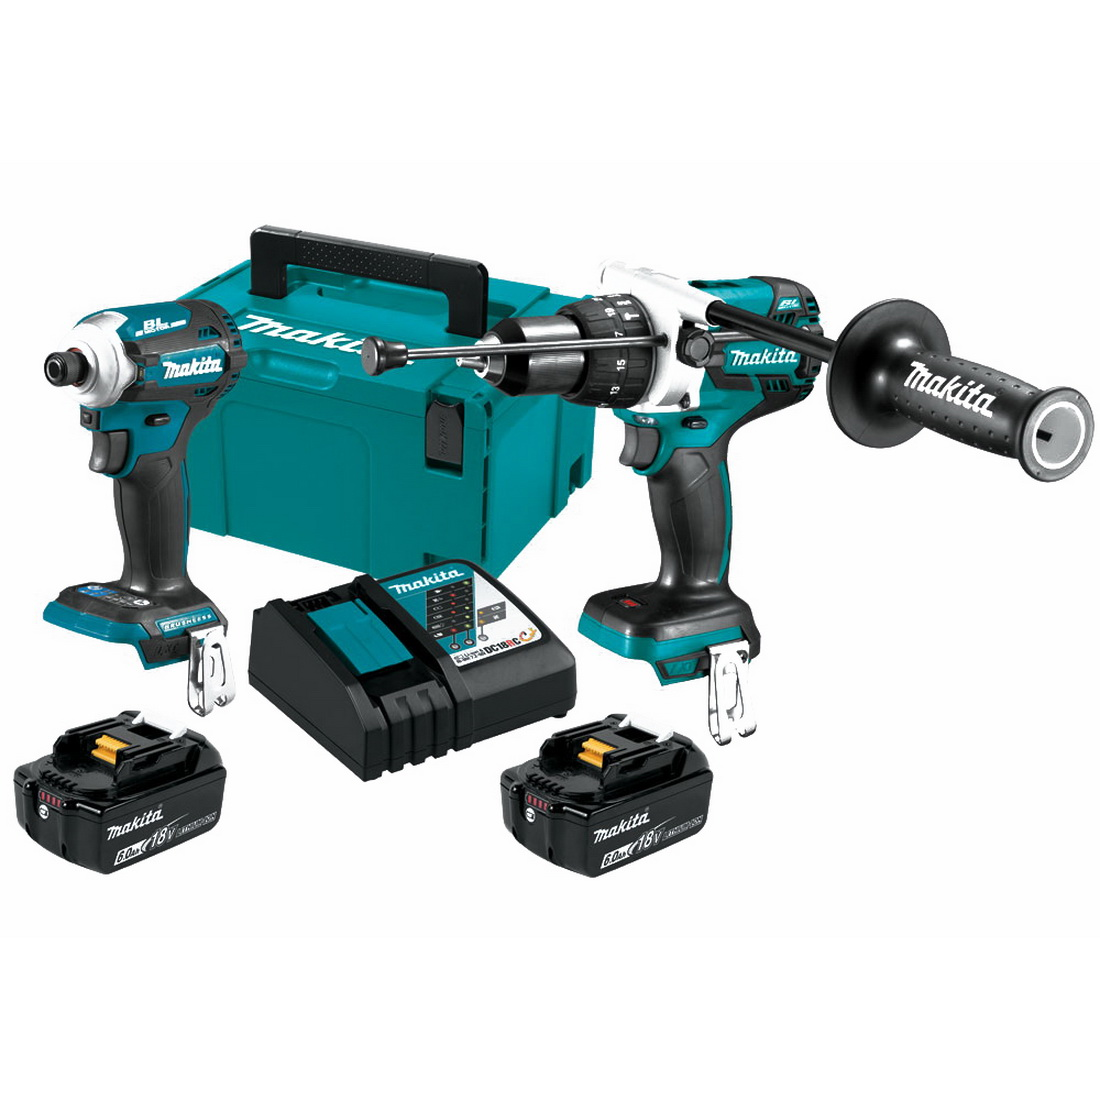 18V 6Ah 2 Piece Li-Ion Brushless Hammer Drill Driver & Impact Driver Kit